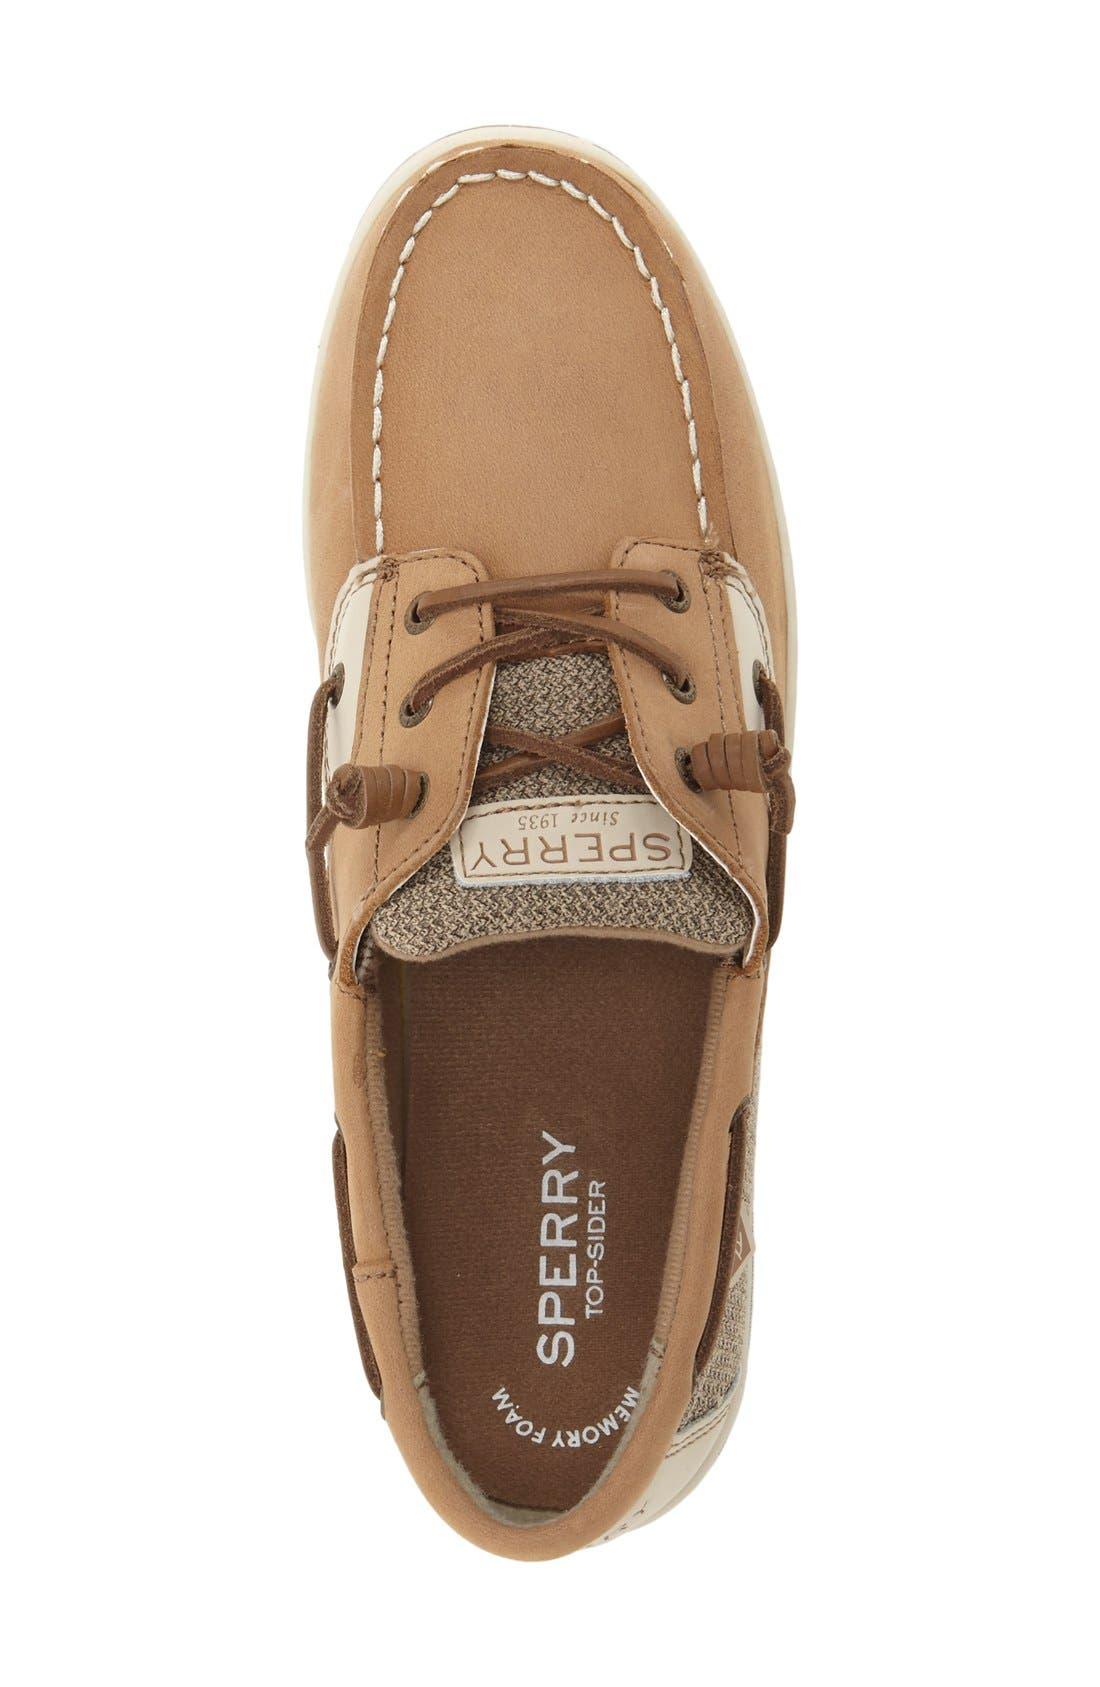 'Songfish' Boat Shoe,                             Alternate thumbnail 3, color,                             Linen/ Oat Leather